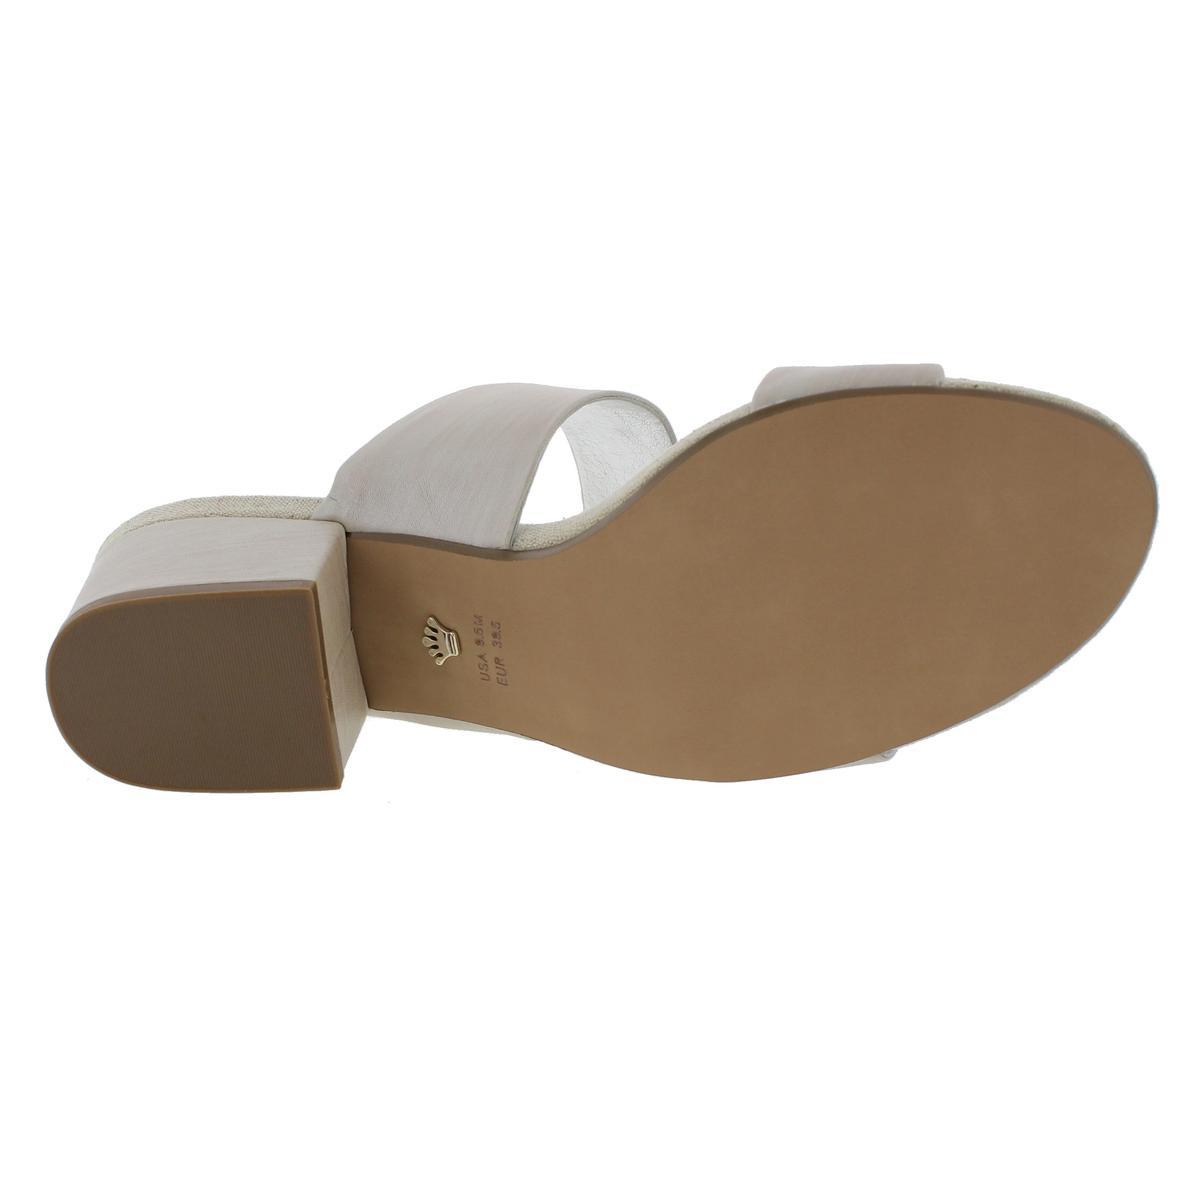 Nina-Womens-Vansi-Strappy-Block-Heel-Open-Toe-Heels-Sandals-BHFO-4278 thumbnail 8